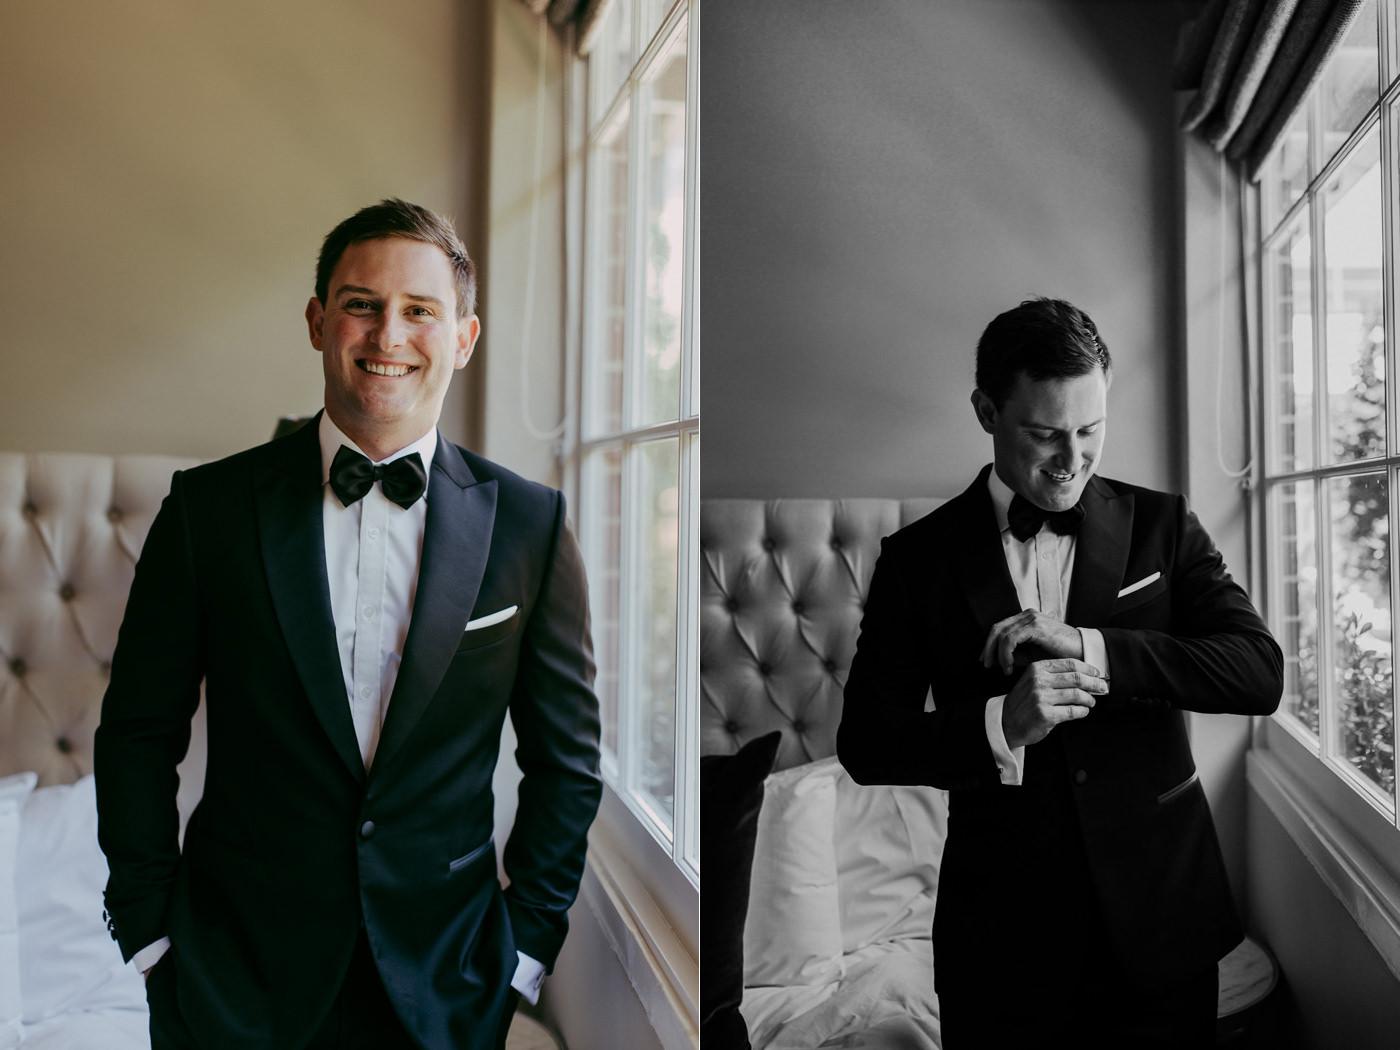 Anthony & Eliet - Wagga Wagga Wedding - Country NSW - Samantha Heather Photography-10.jpg